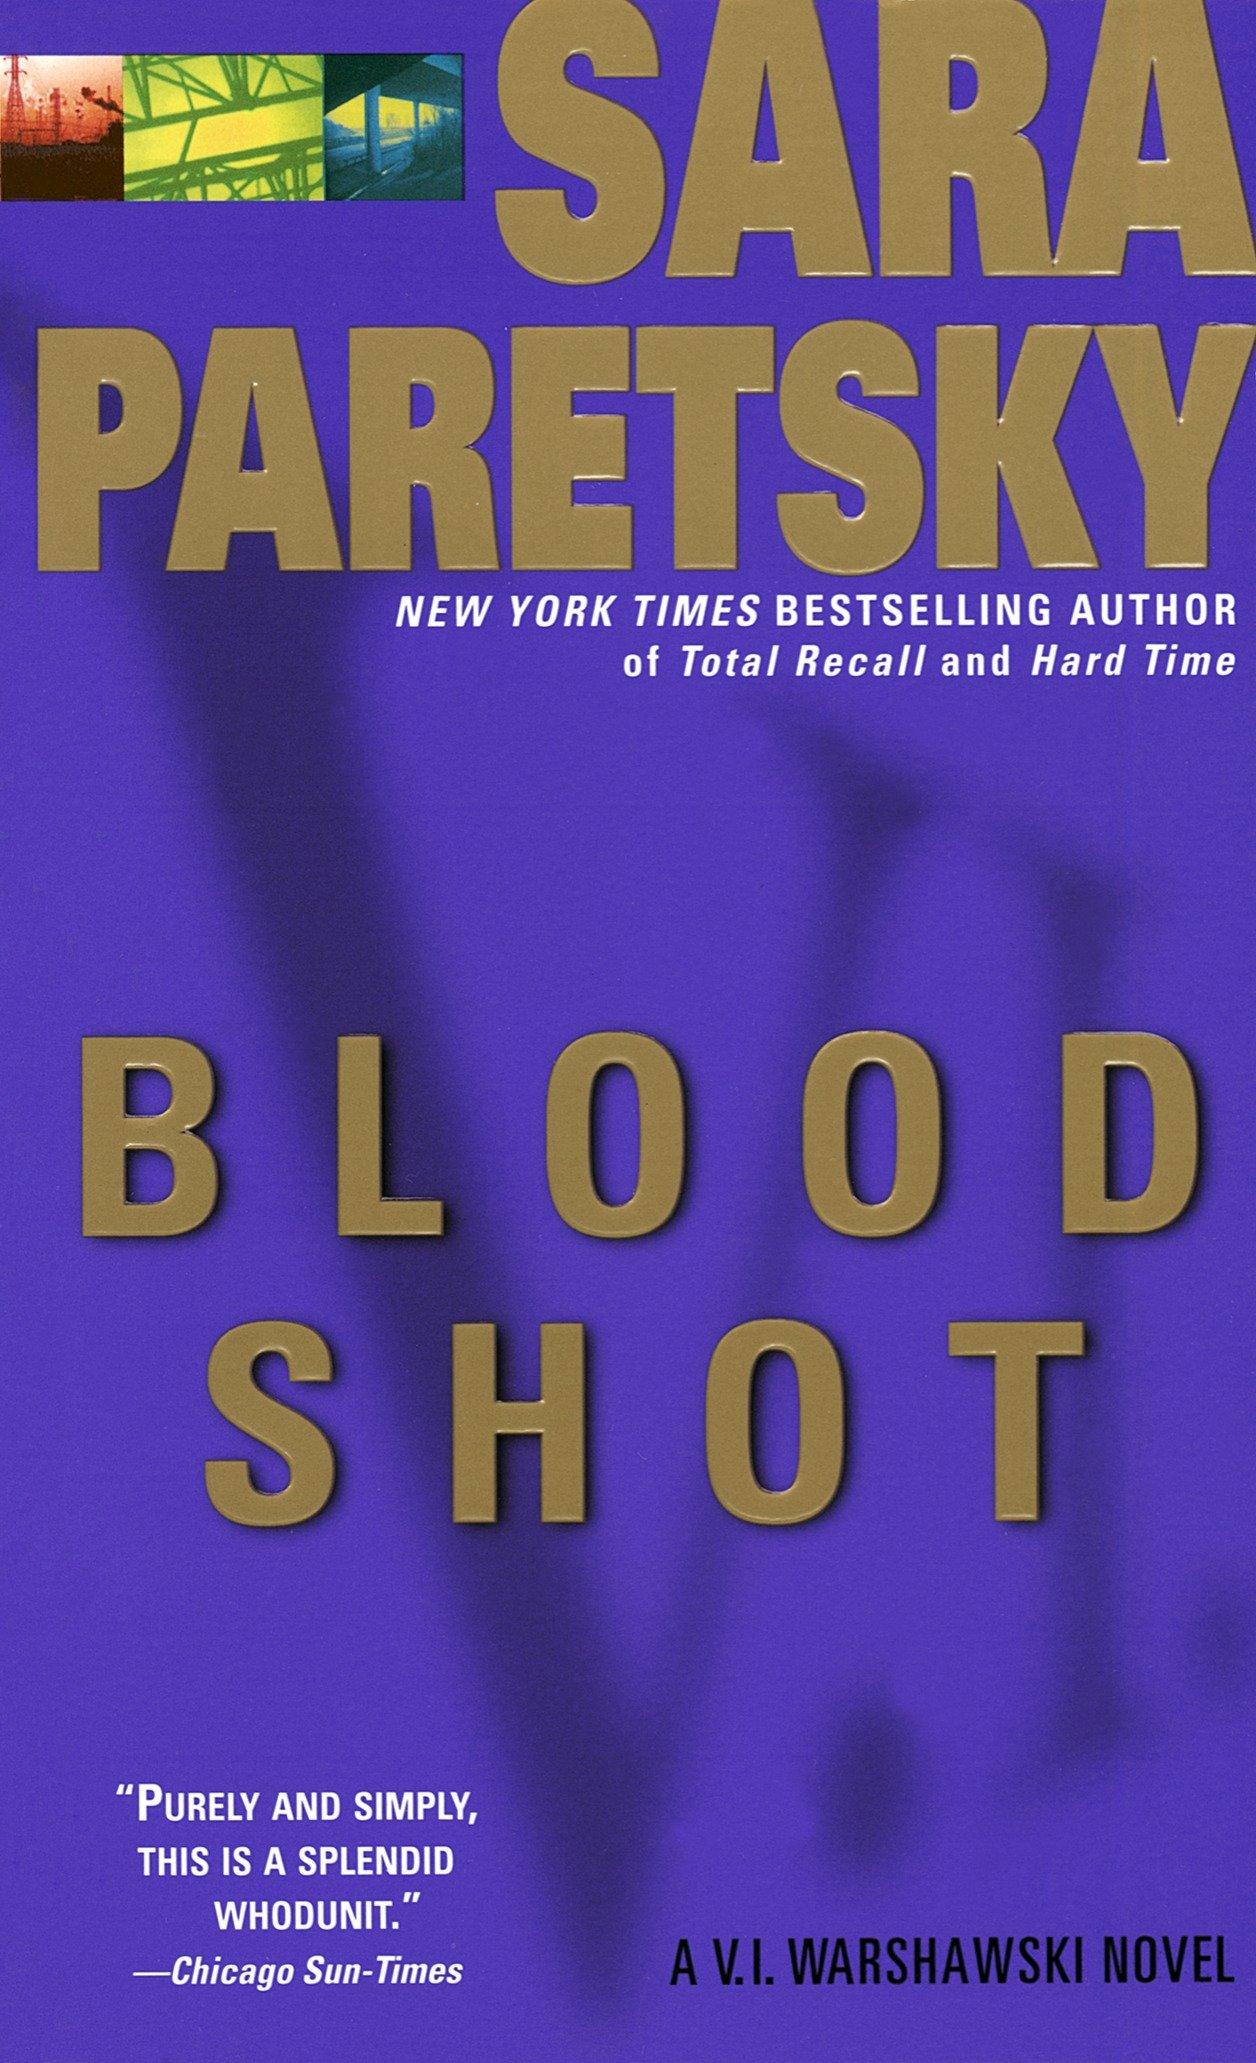 Blood shot cover image